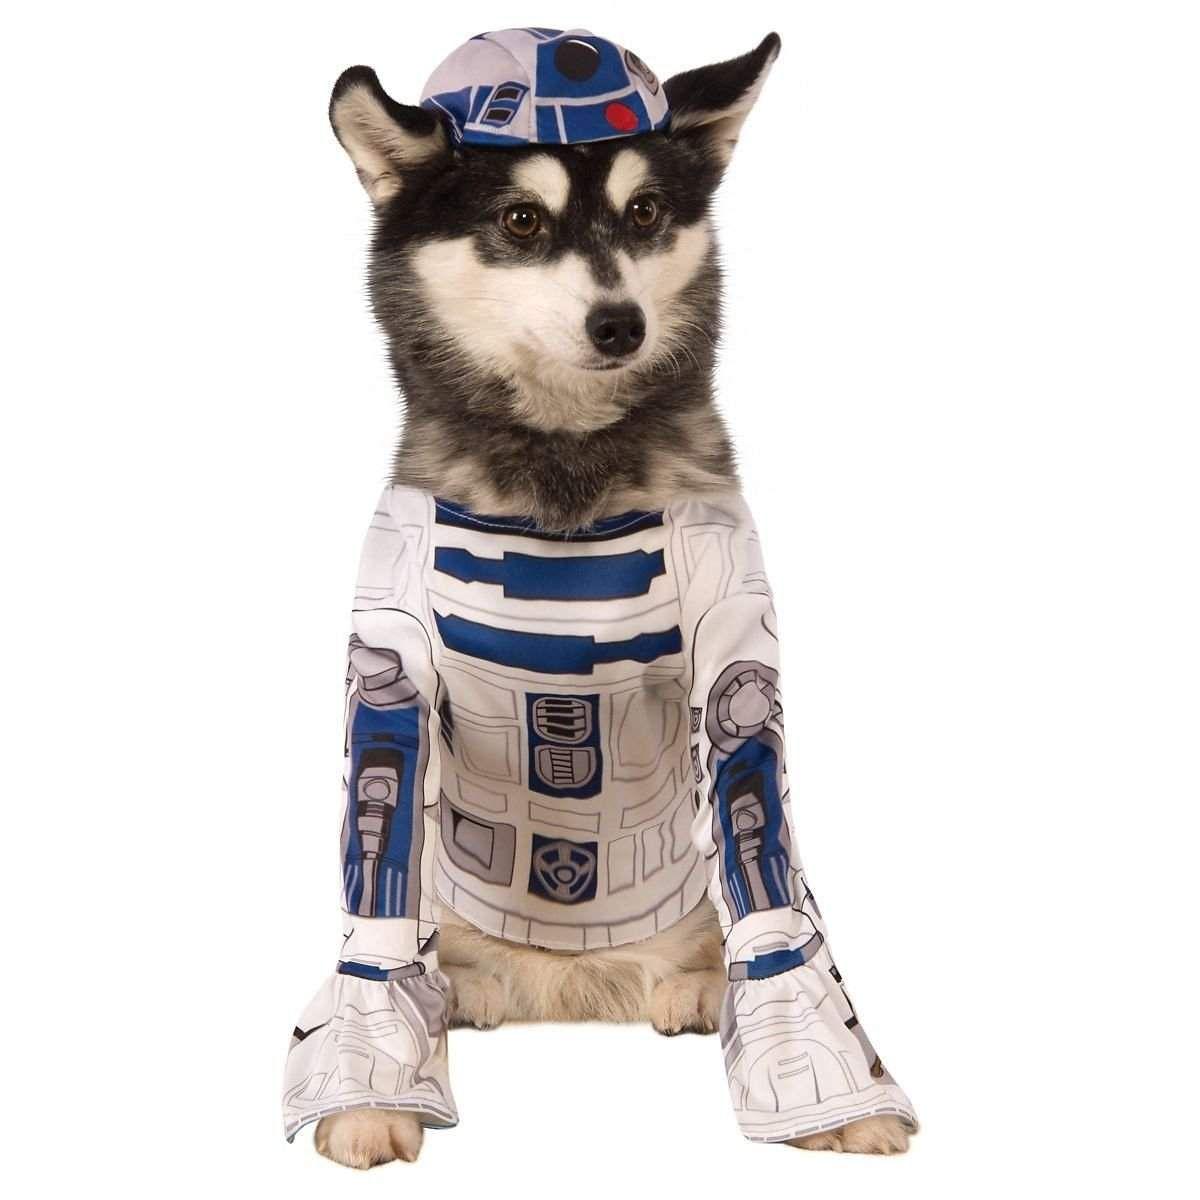 dog halloween costume, dog costumes, pet costumes, halloween